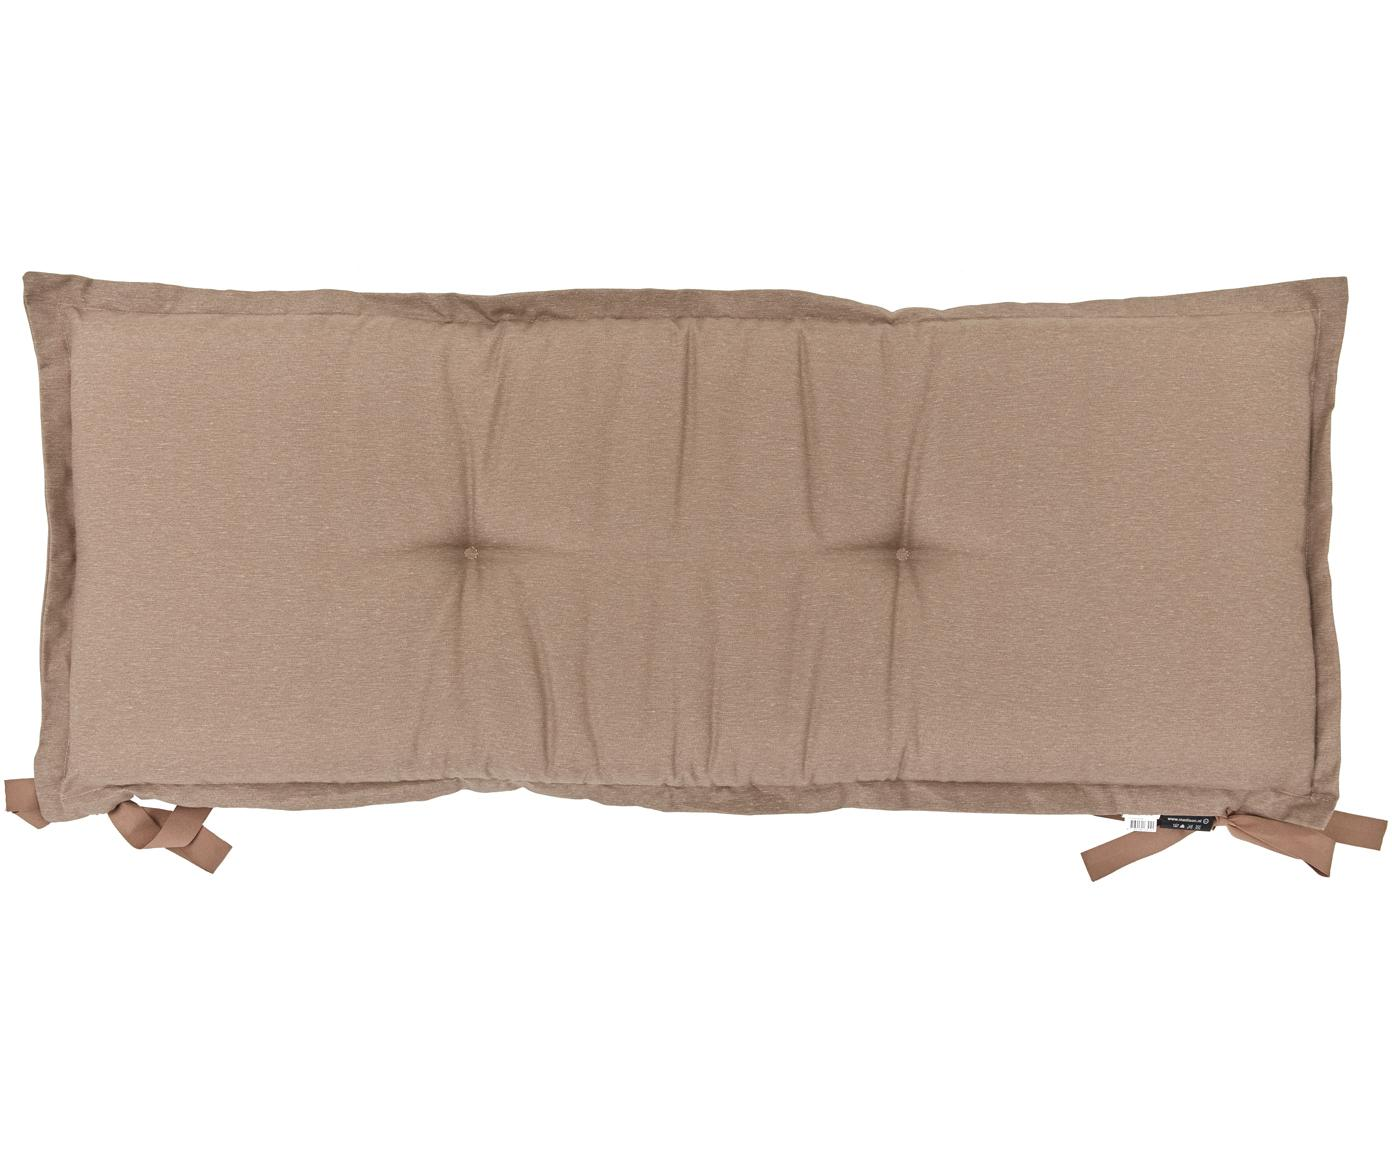 Einfarbige Bankauflage Panama, Bezug: 50% Baumwolle, 45% Polyes, Taupe, 48 x 150 cm